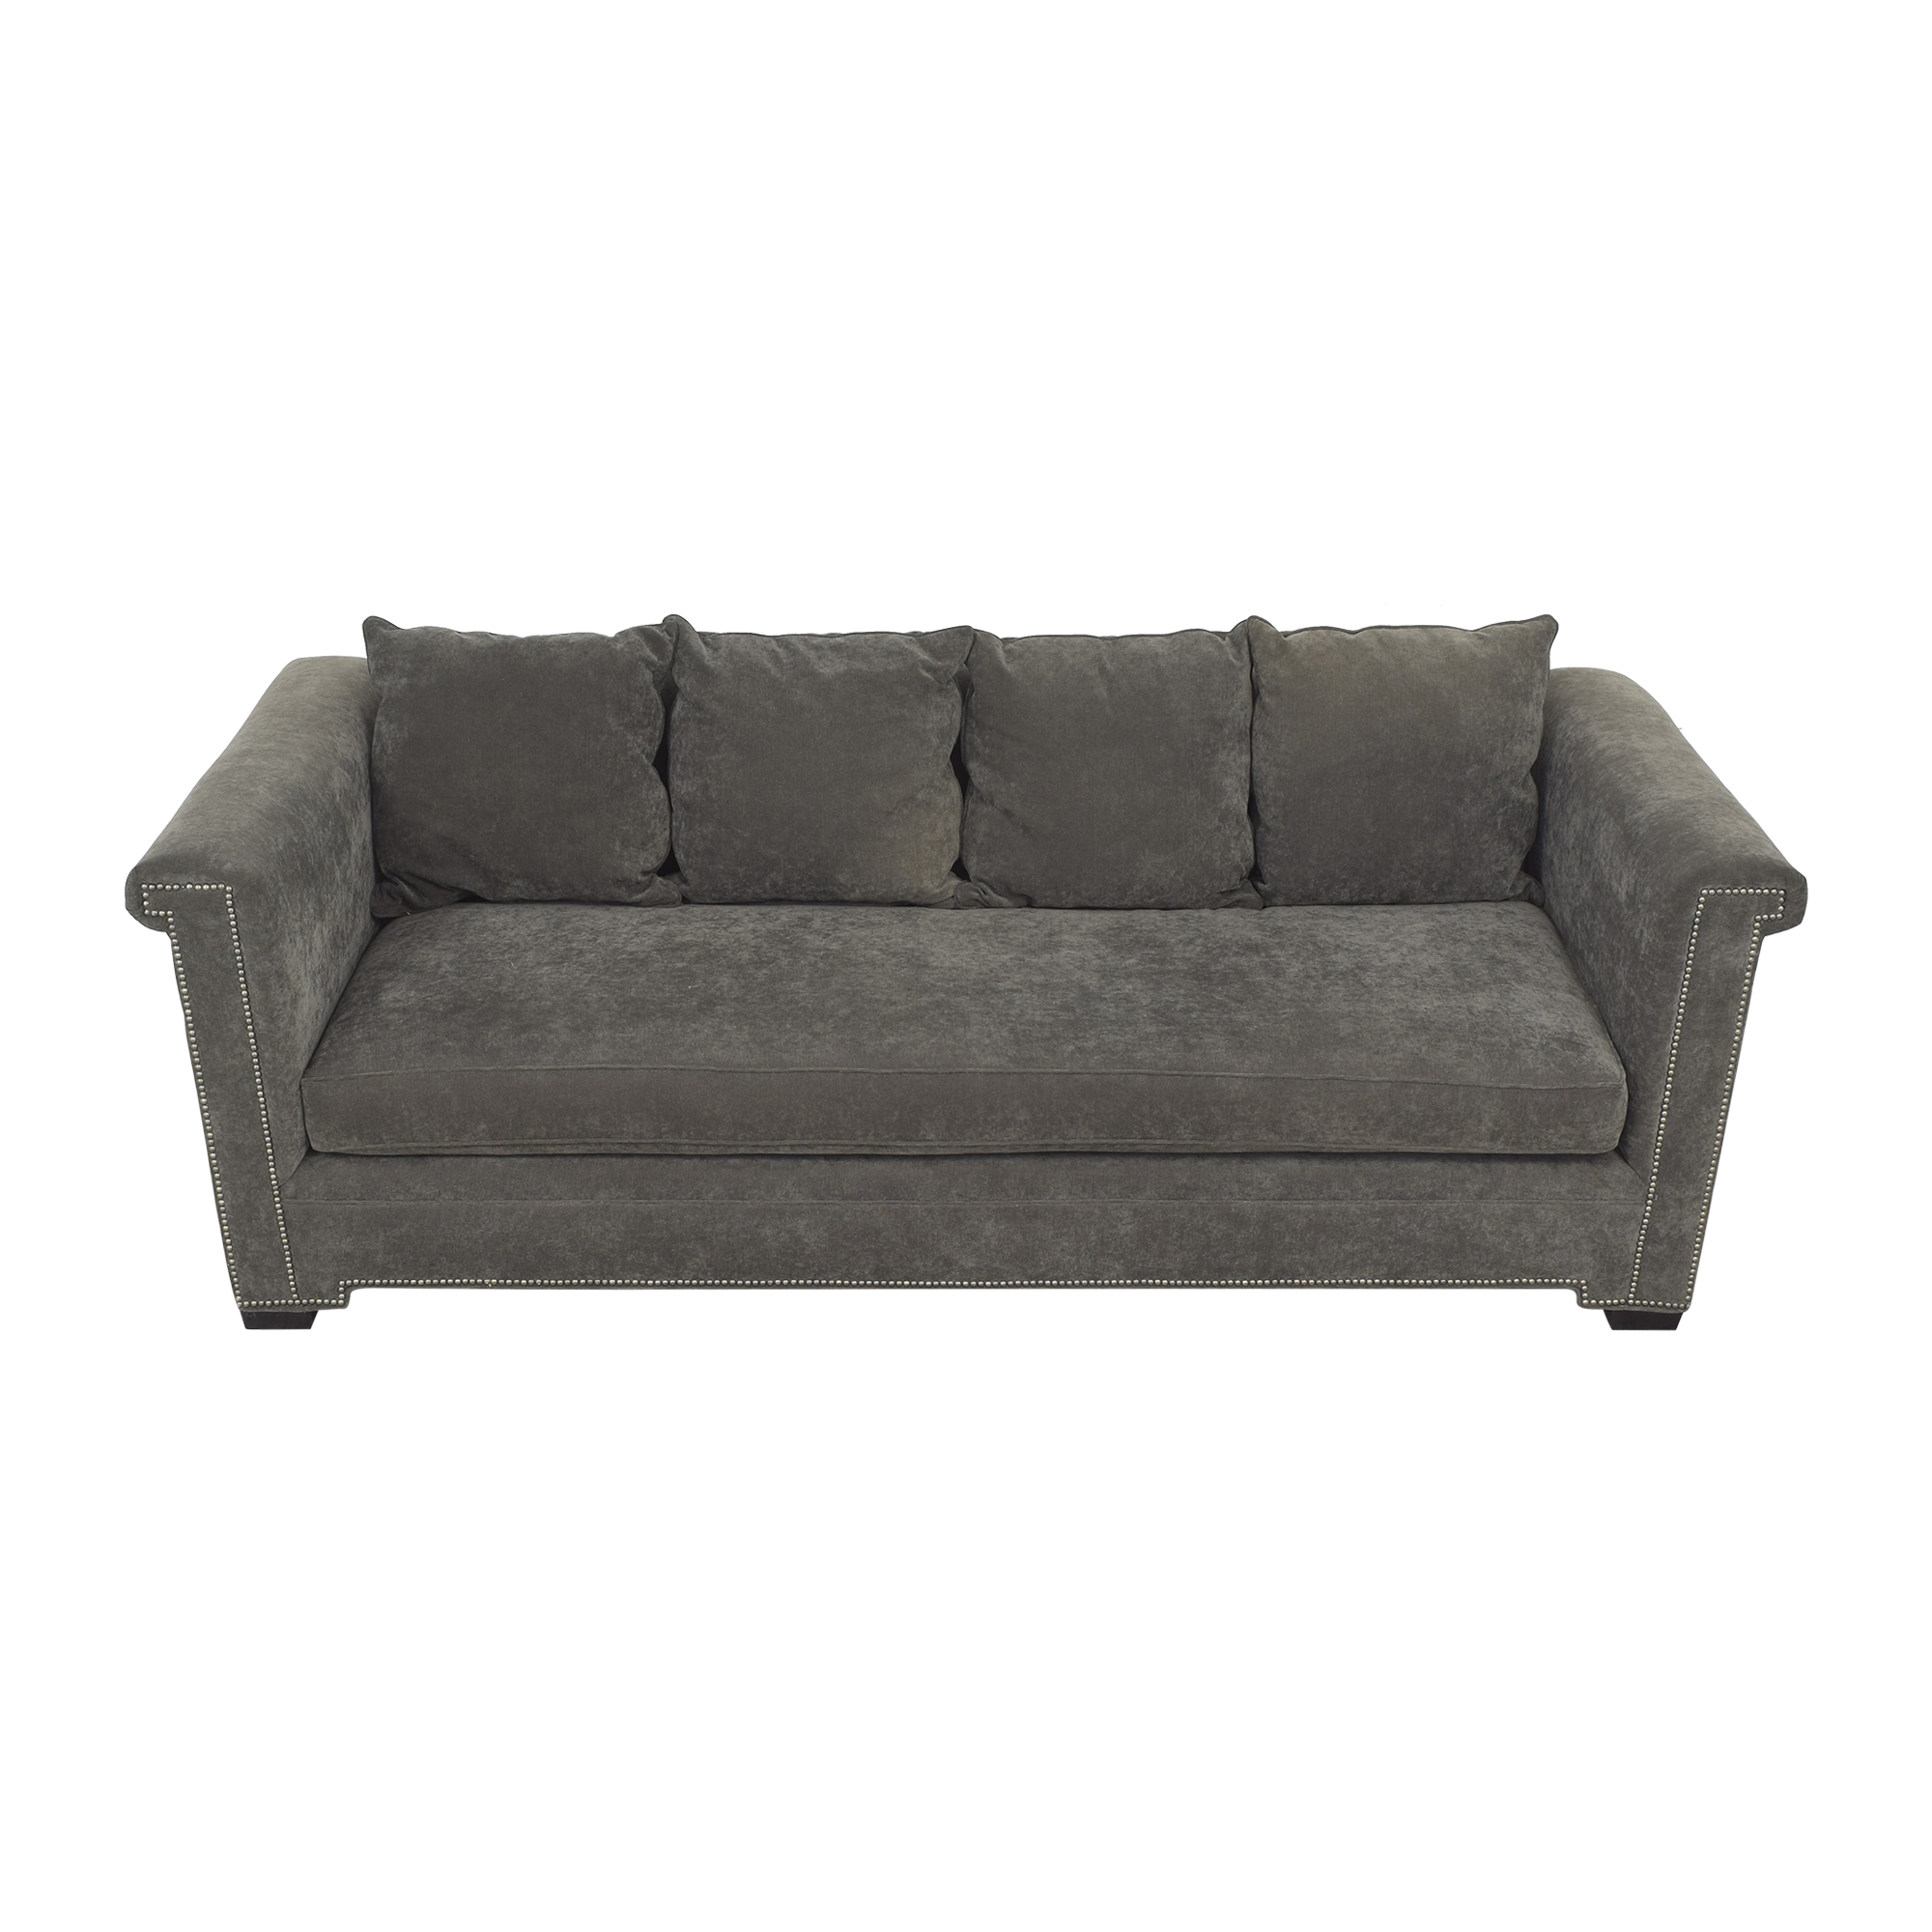 Gabby Home Gabby Home Bench Cushion Sofa nyc